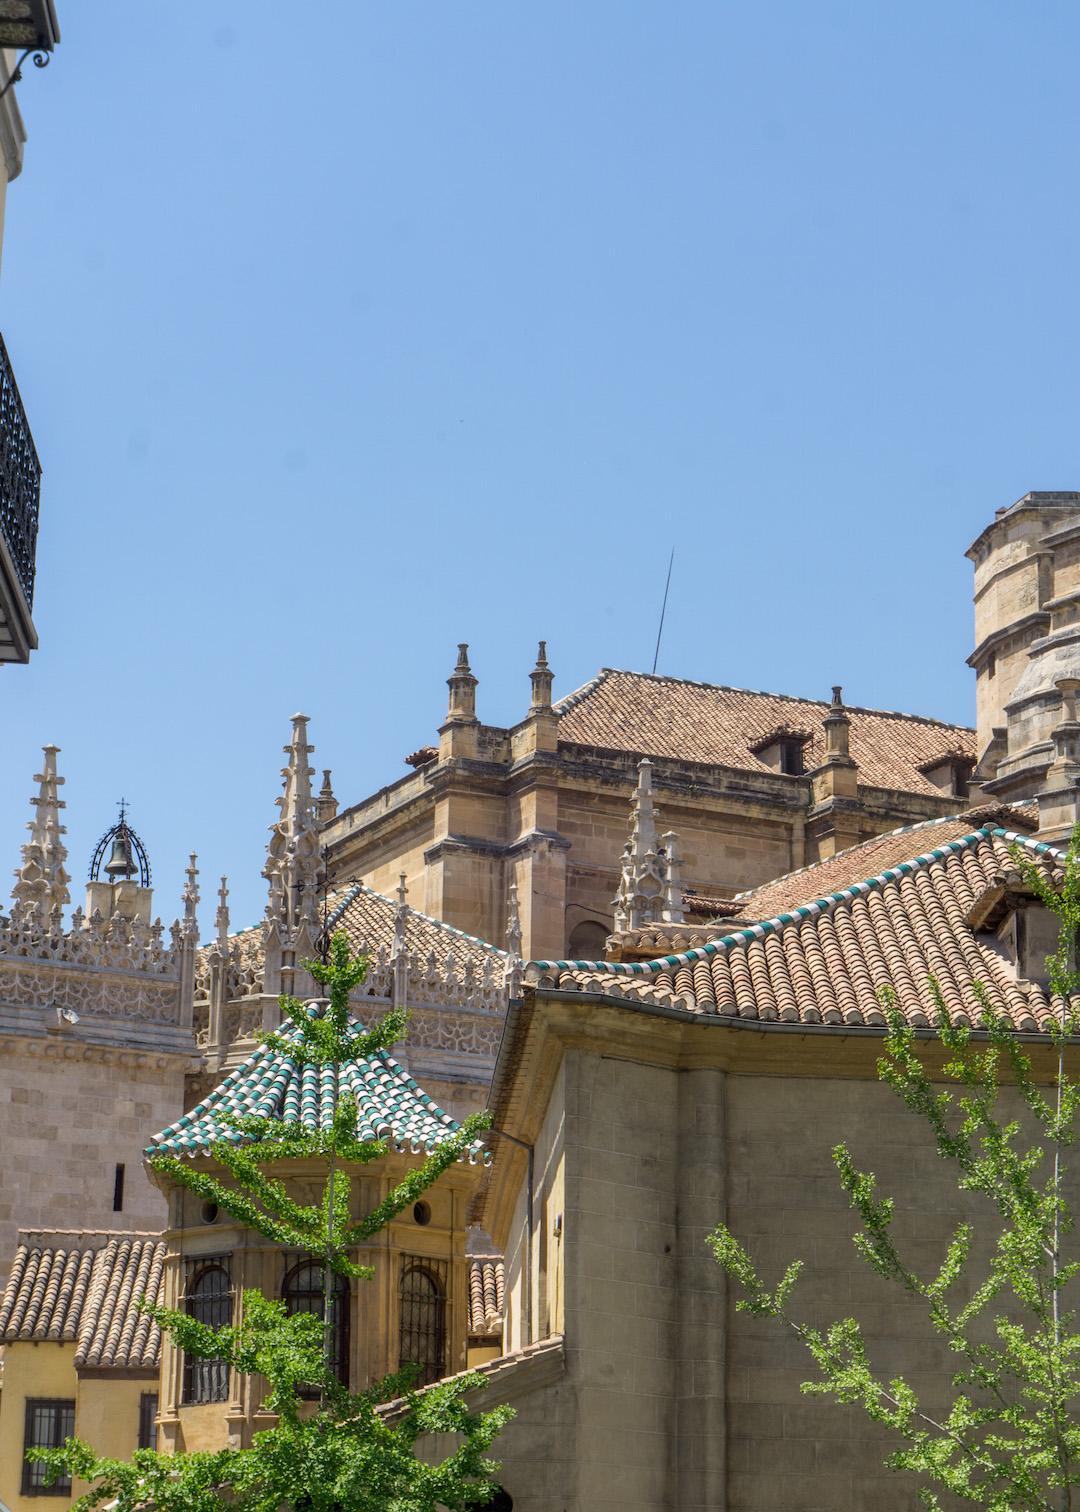 Her_Travel_Edit_Granada_University